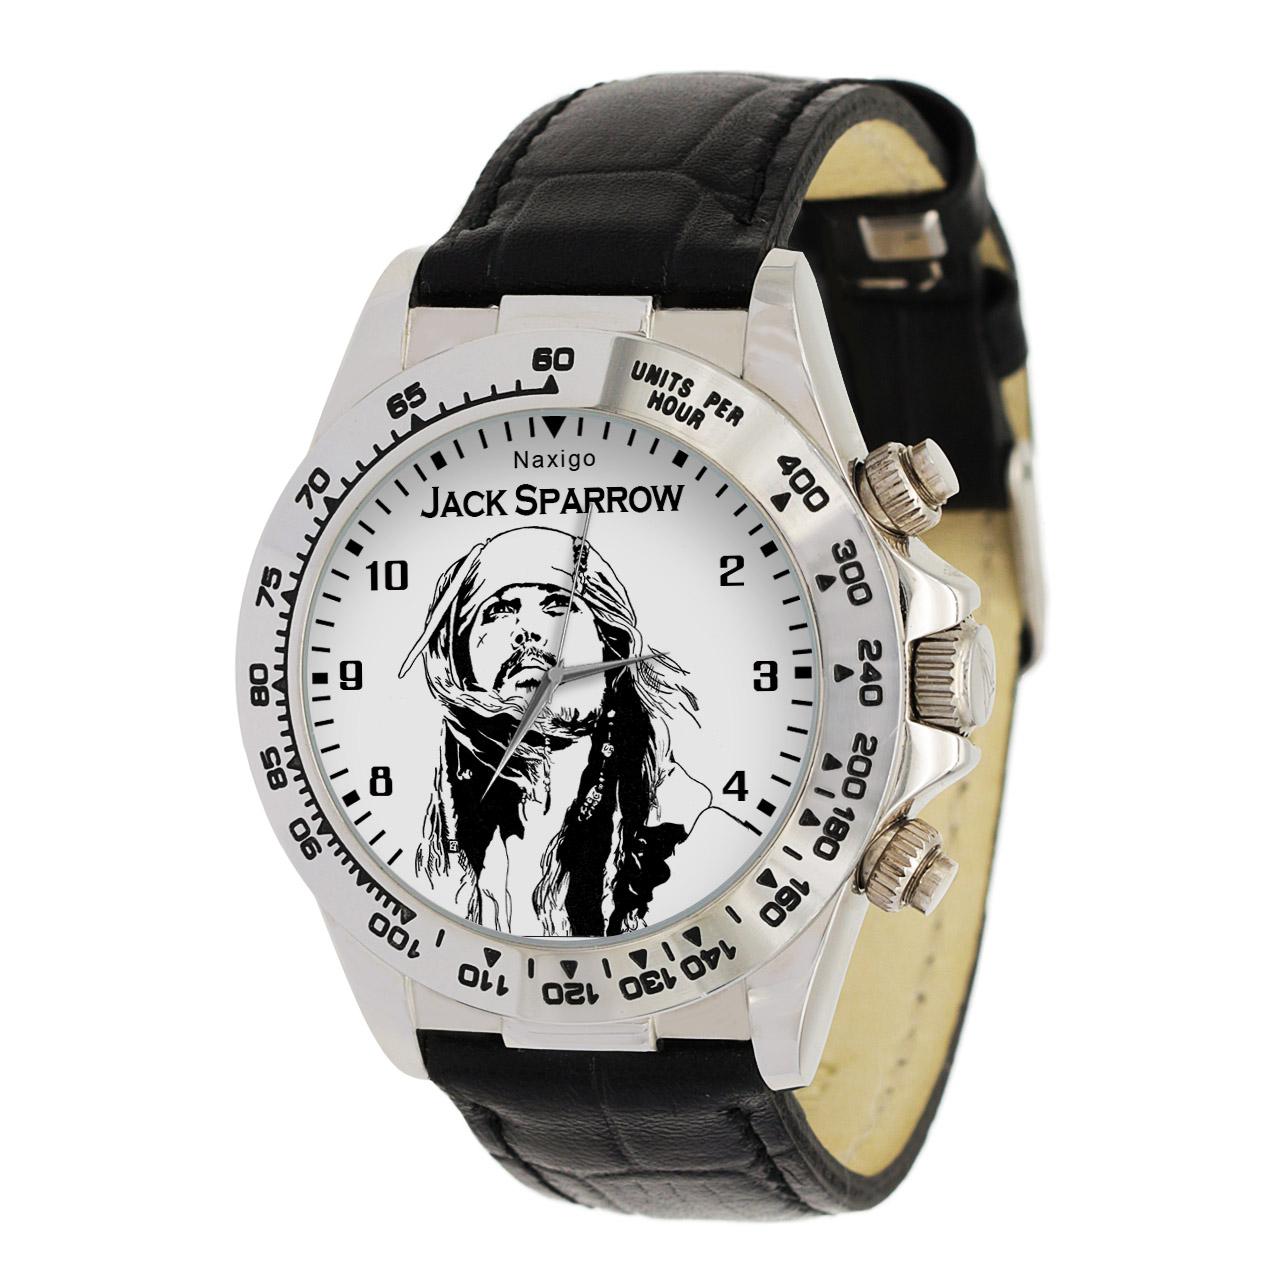 ساعت مچی  مردانه ناکسیگو طرح جک اسپارو کد LS3547